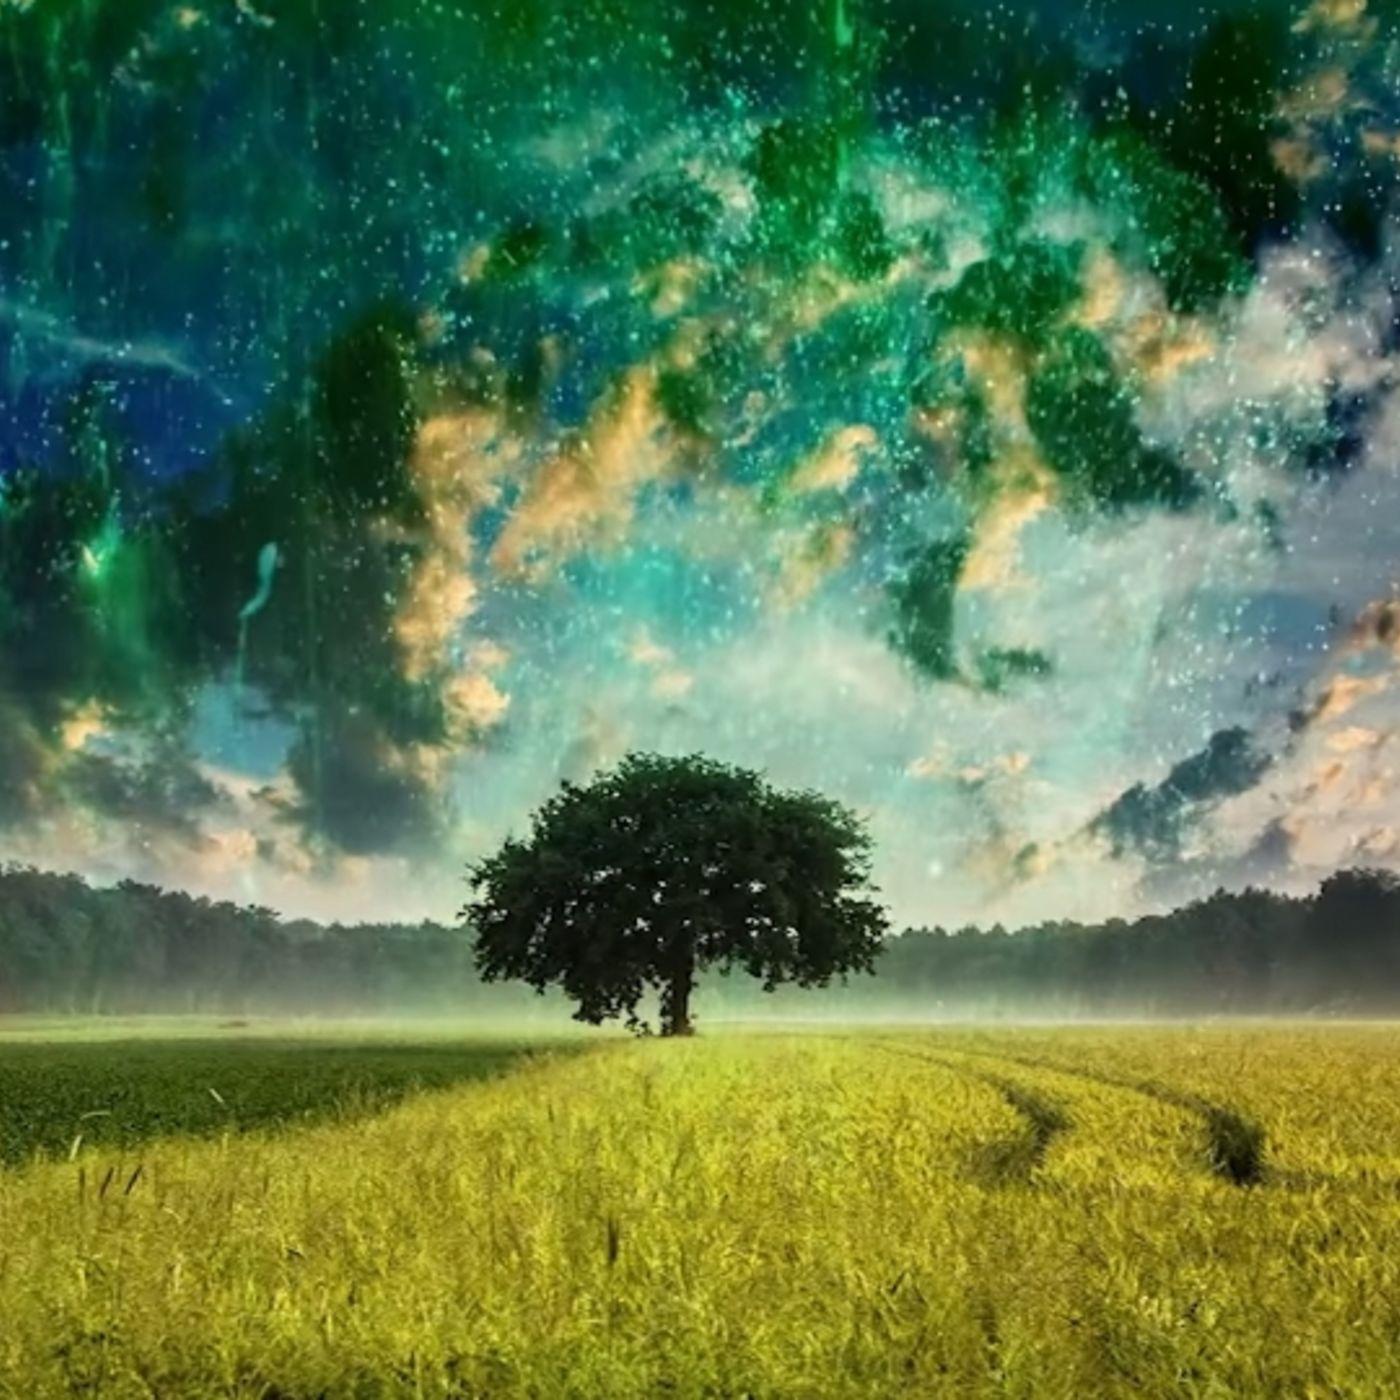 Earth Energy Illumination News for December 21st - 28th